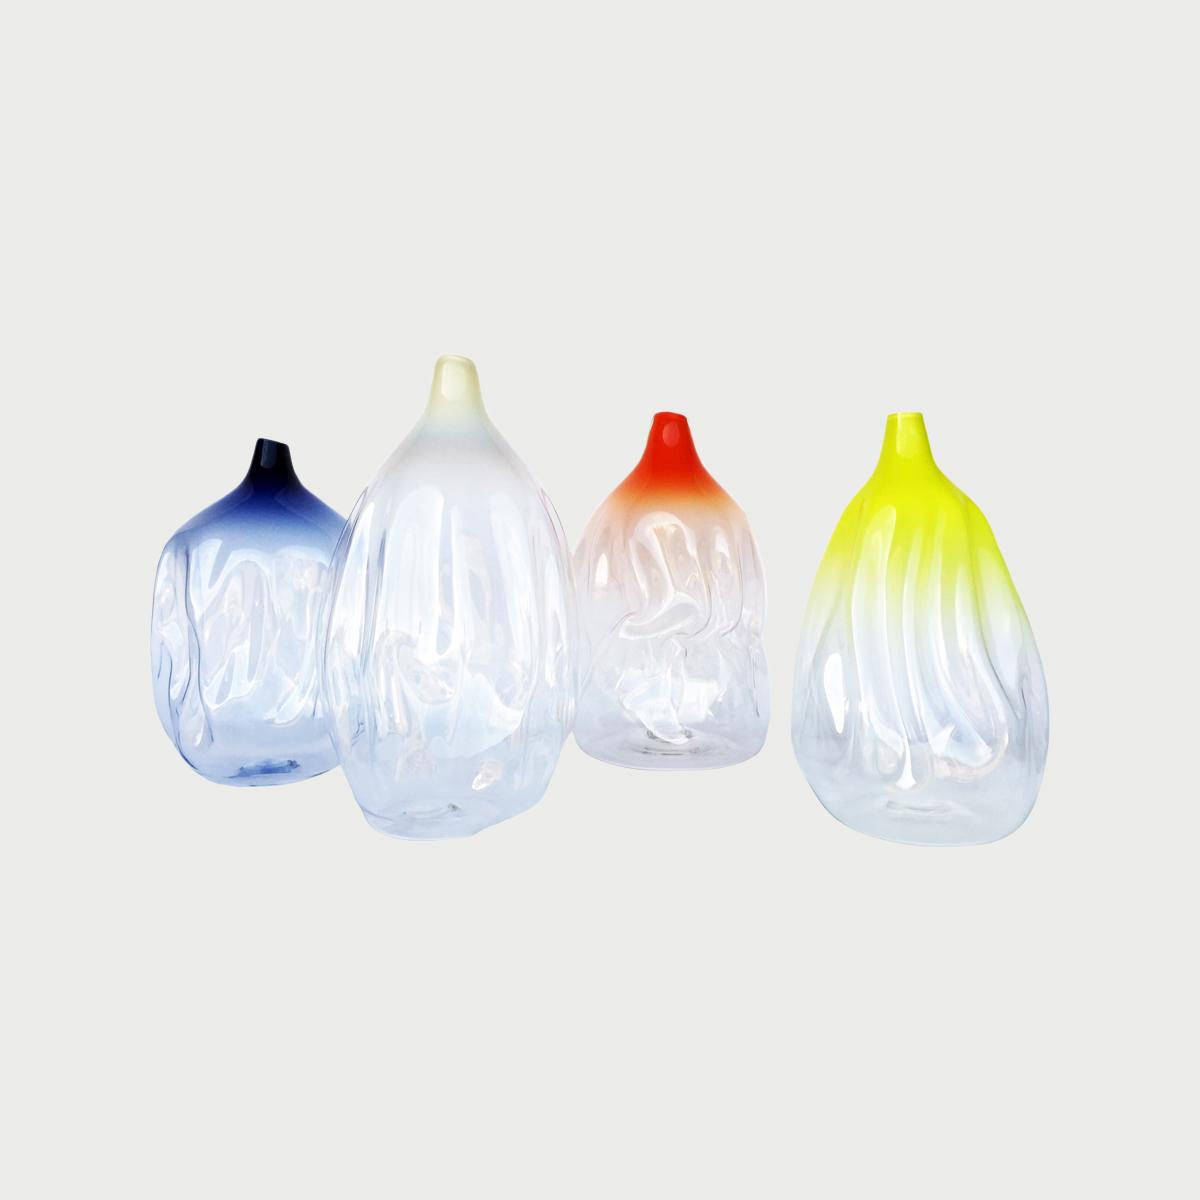 Deflate vase all